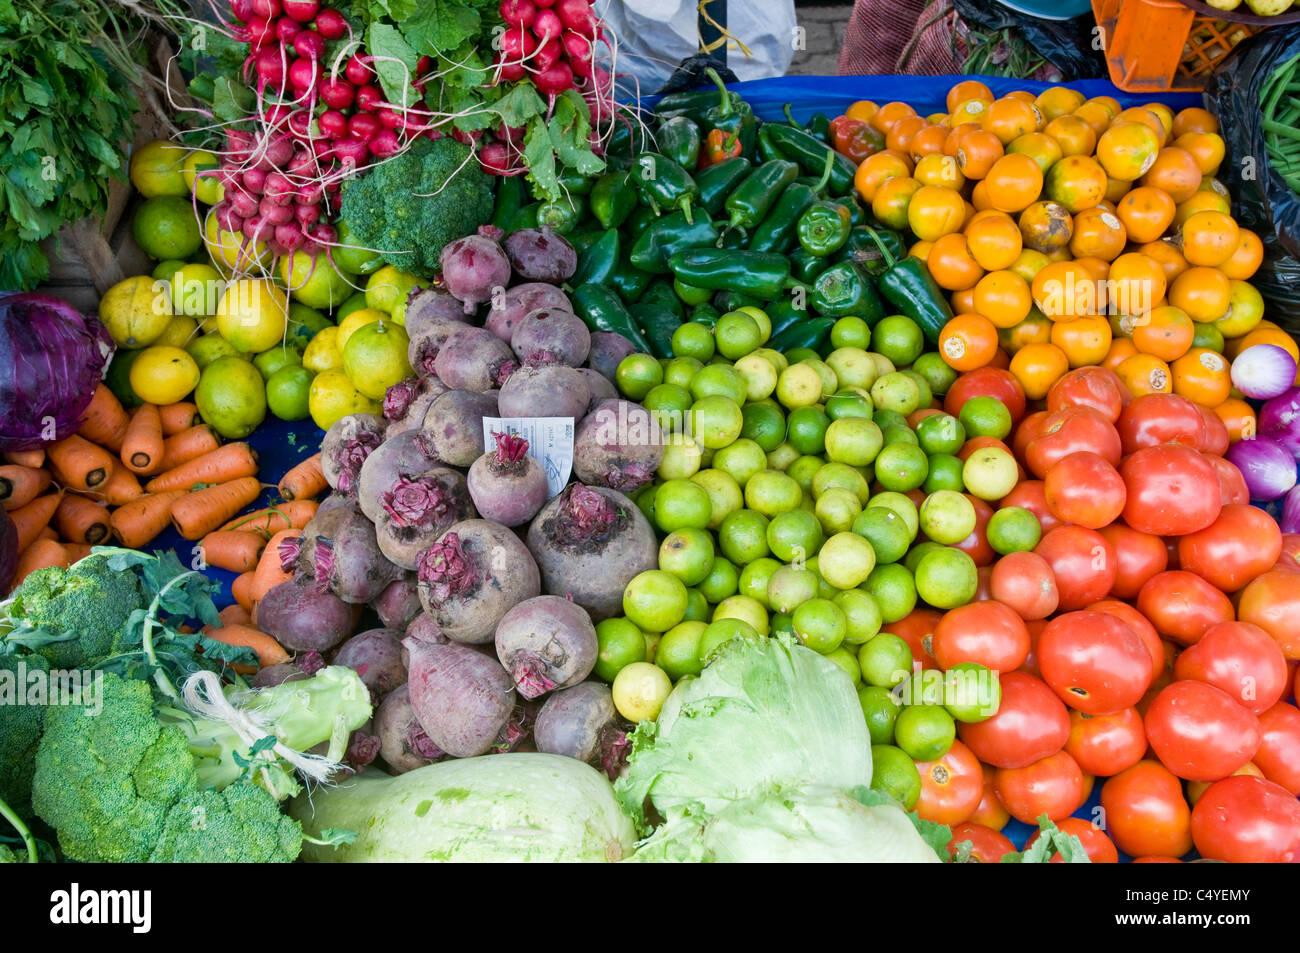 Vegetable market in Otavalo Ecuador - Stock Image